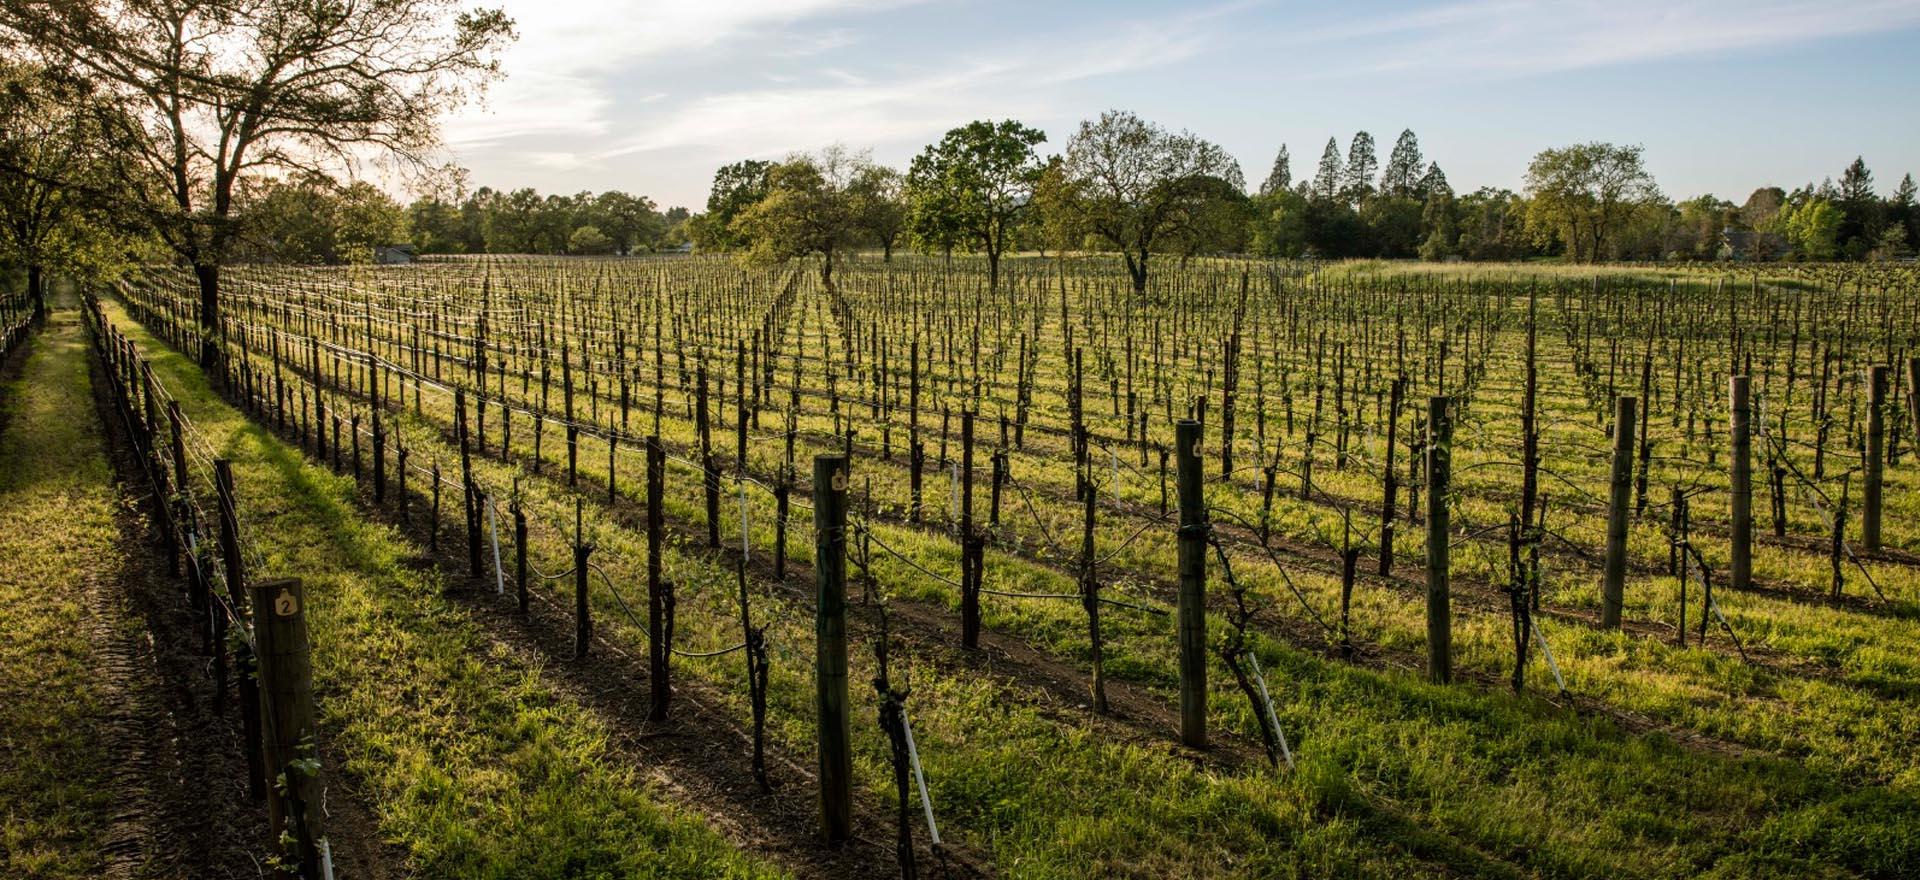 lafollette-wines-vineyards